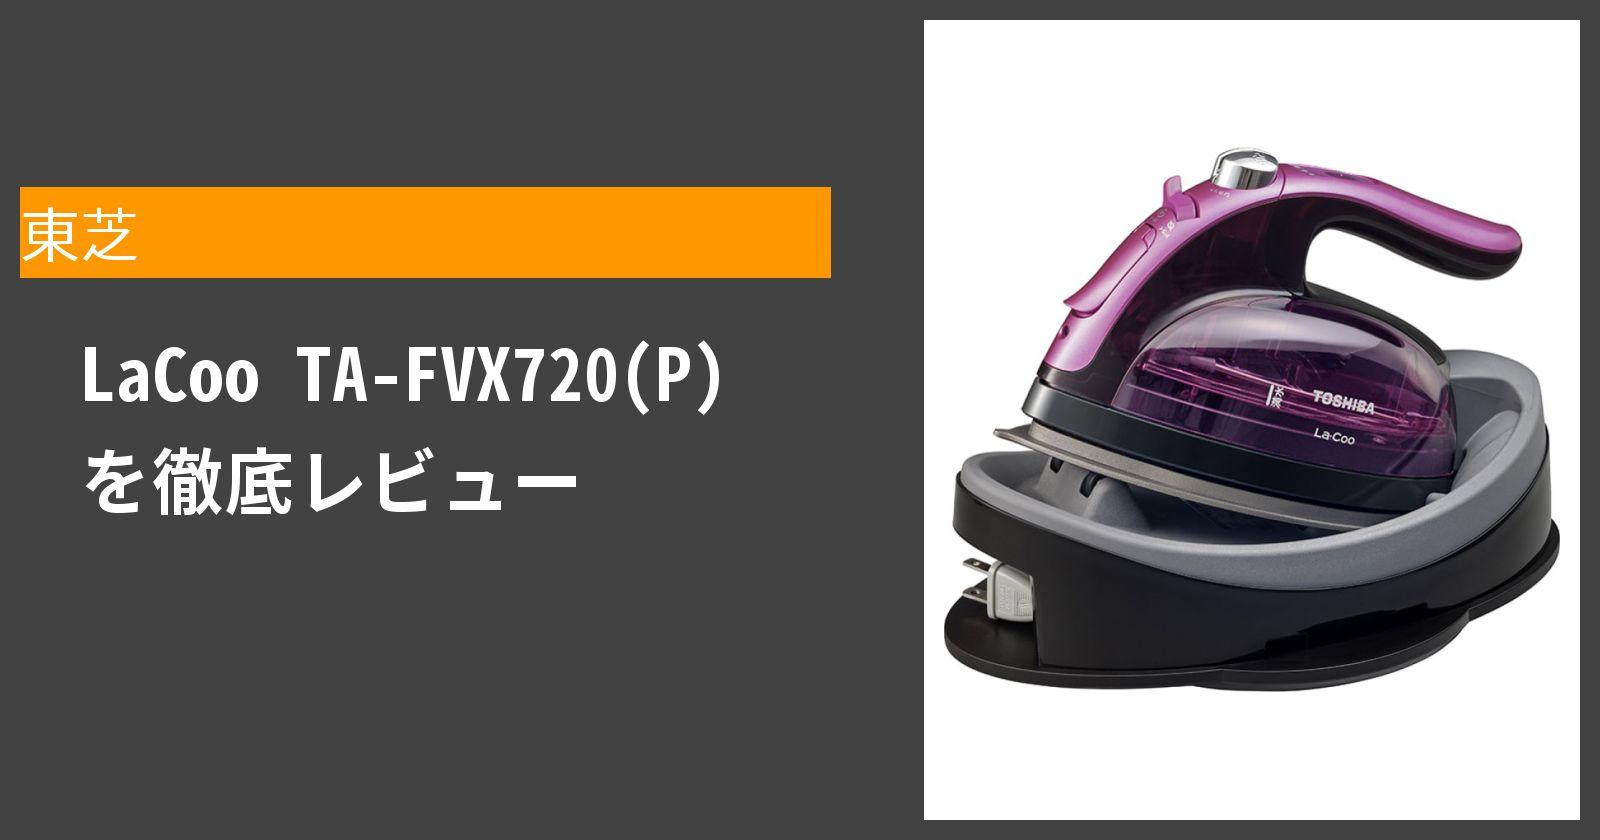 LaCoo TA-FVX720(P)を徹底評価